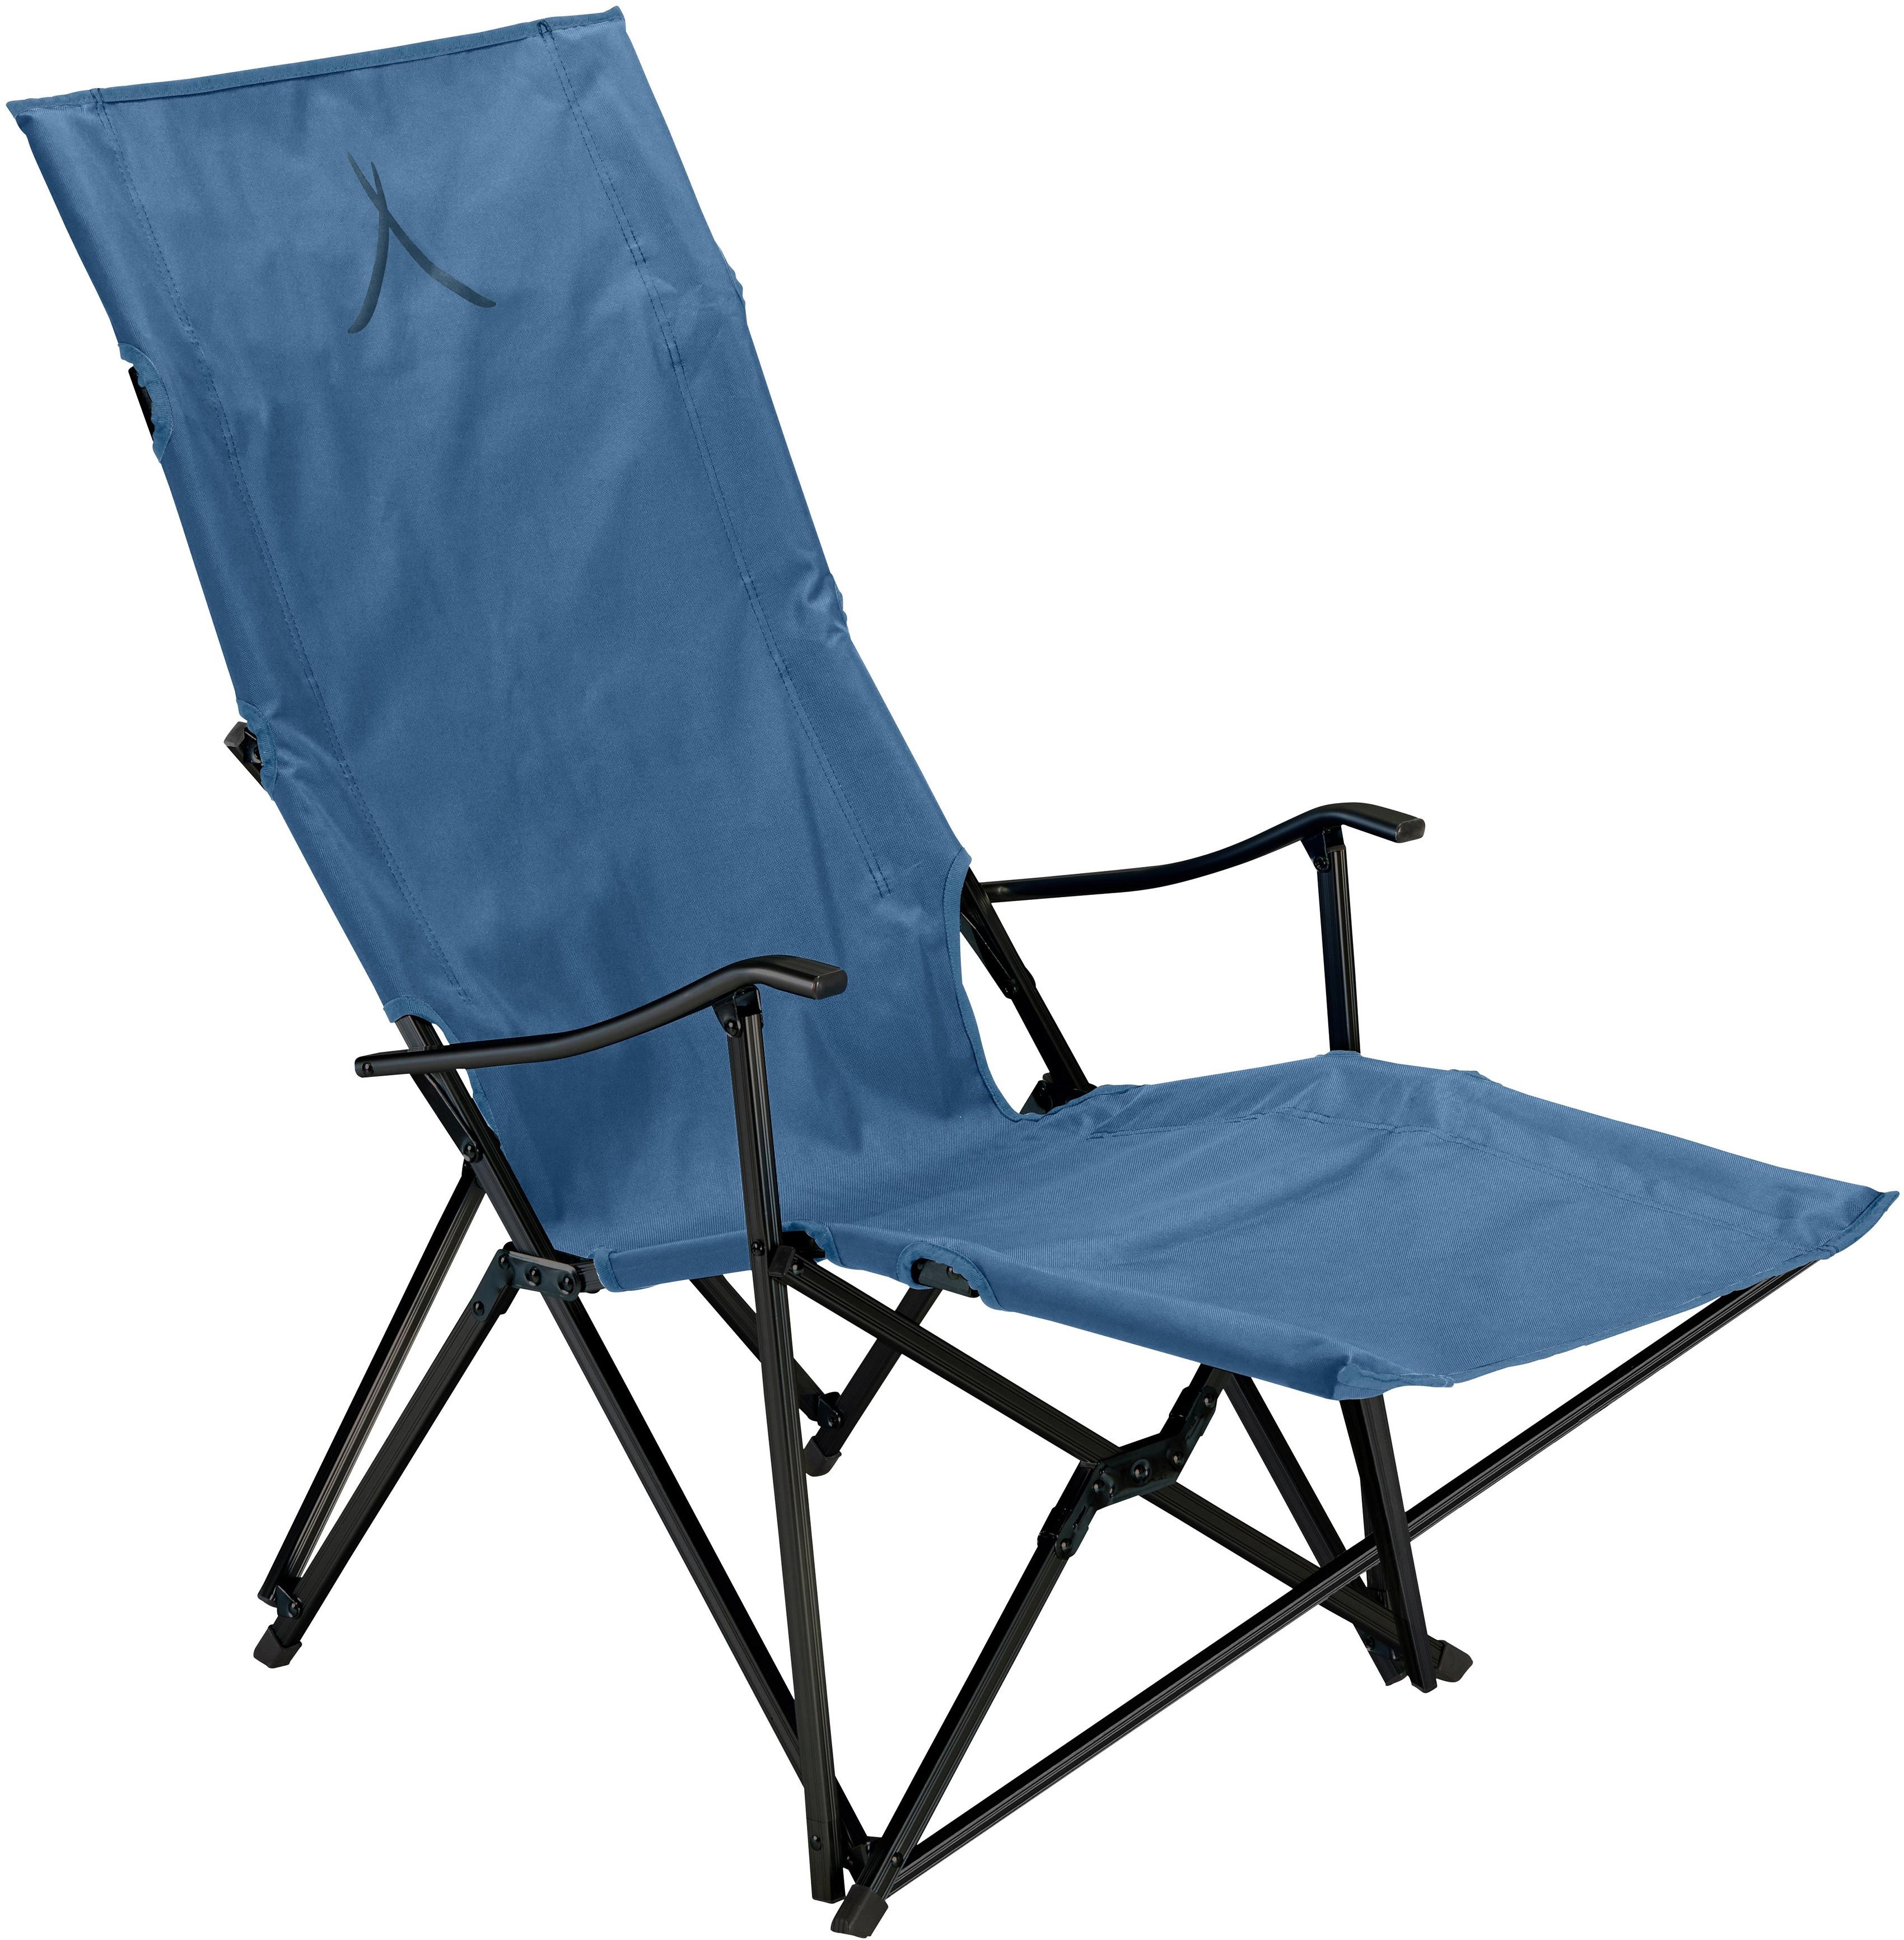 GRAND CANYON Campingstuhl EL TOVAR LOUNGER blau Campingmöbel Camping Schlafen Outdoor